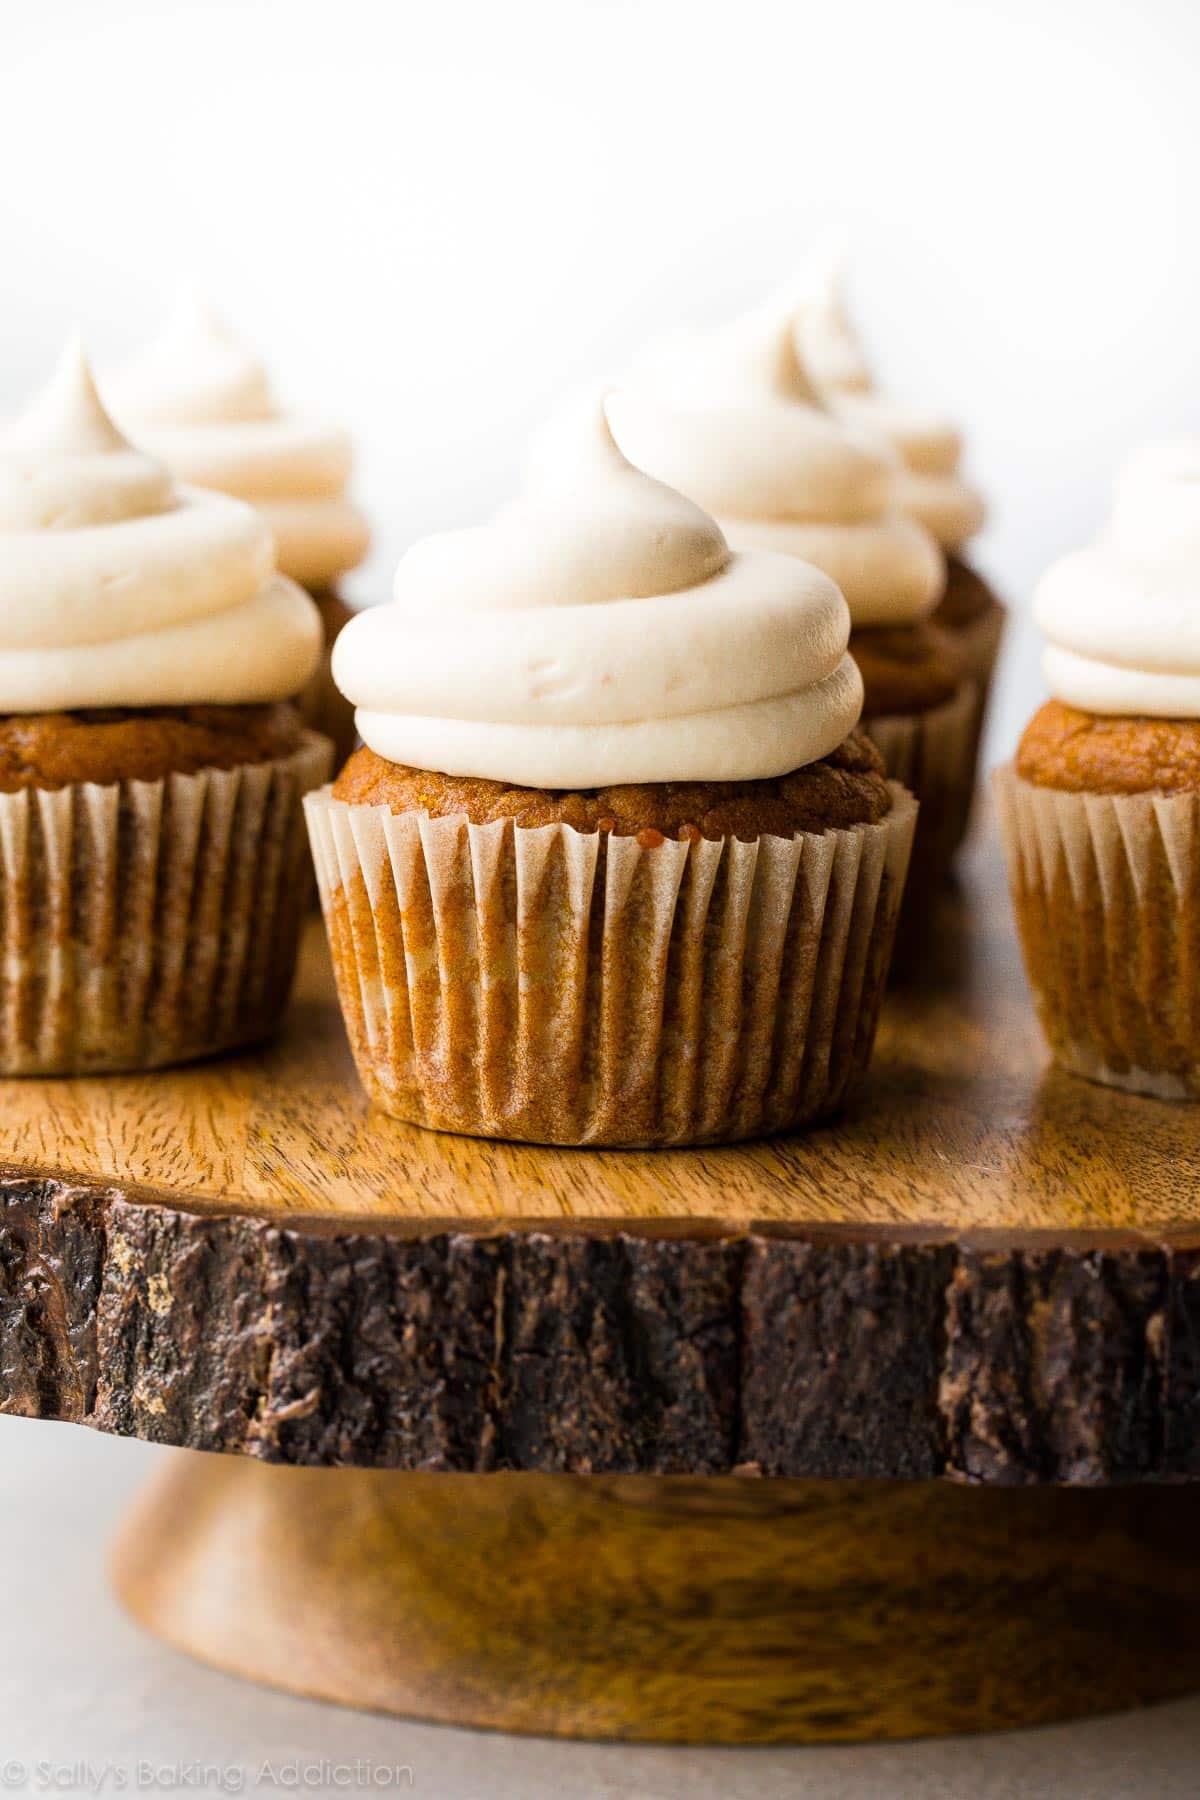 Pumpkin Cupcakes Pumpkin Cupcakes With Cream Cheese Frosting  Sallys Baking Addiction